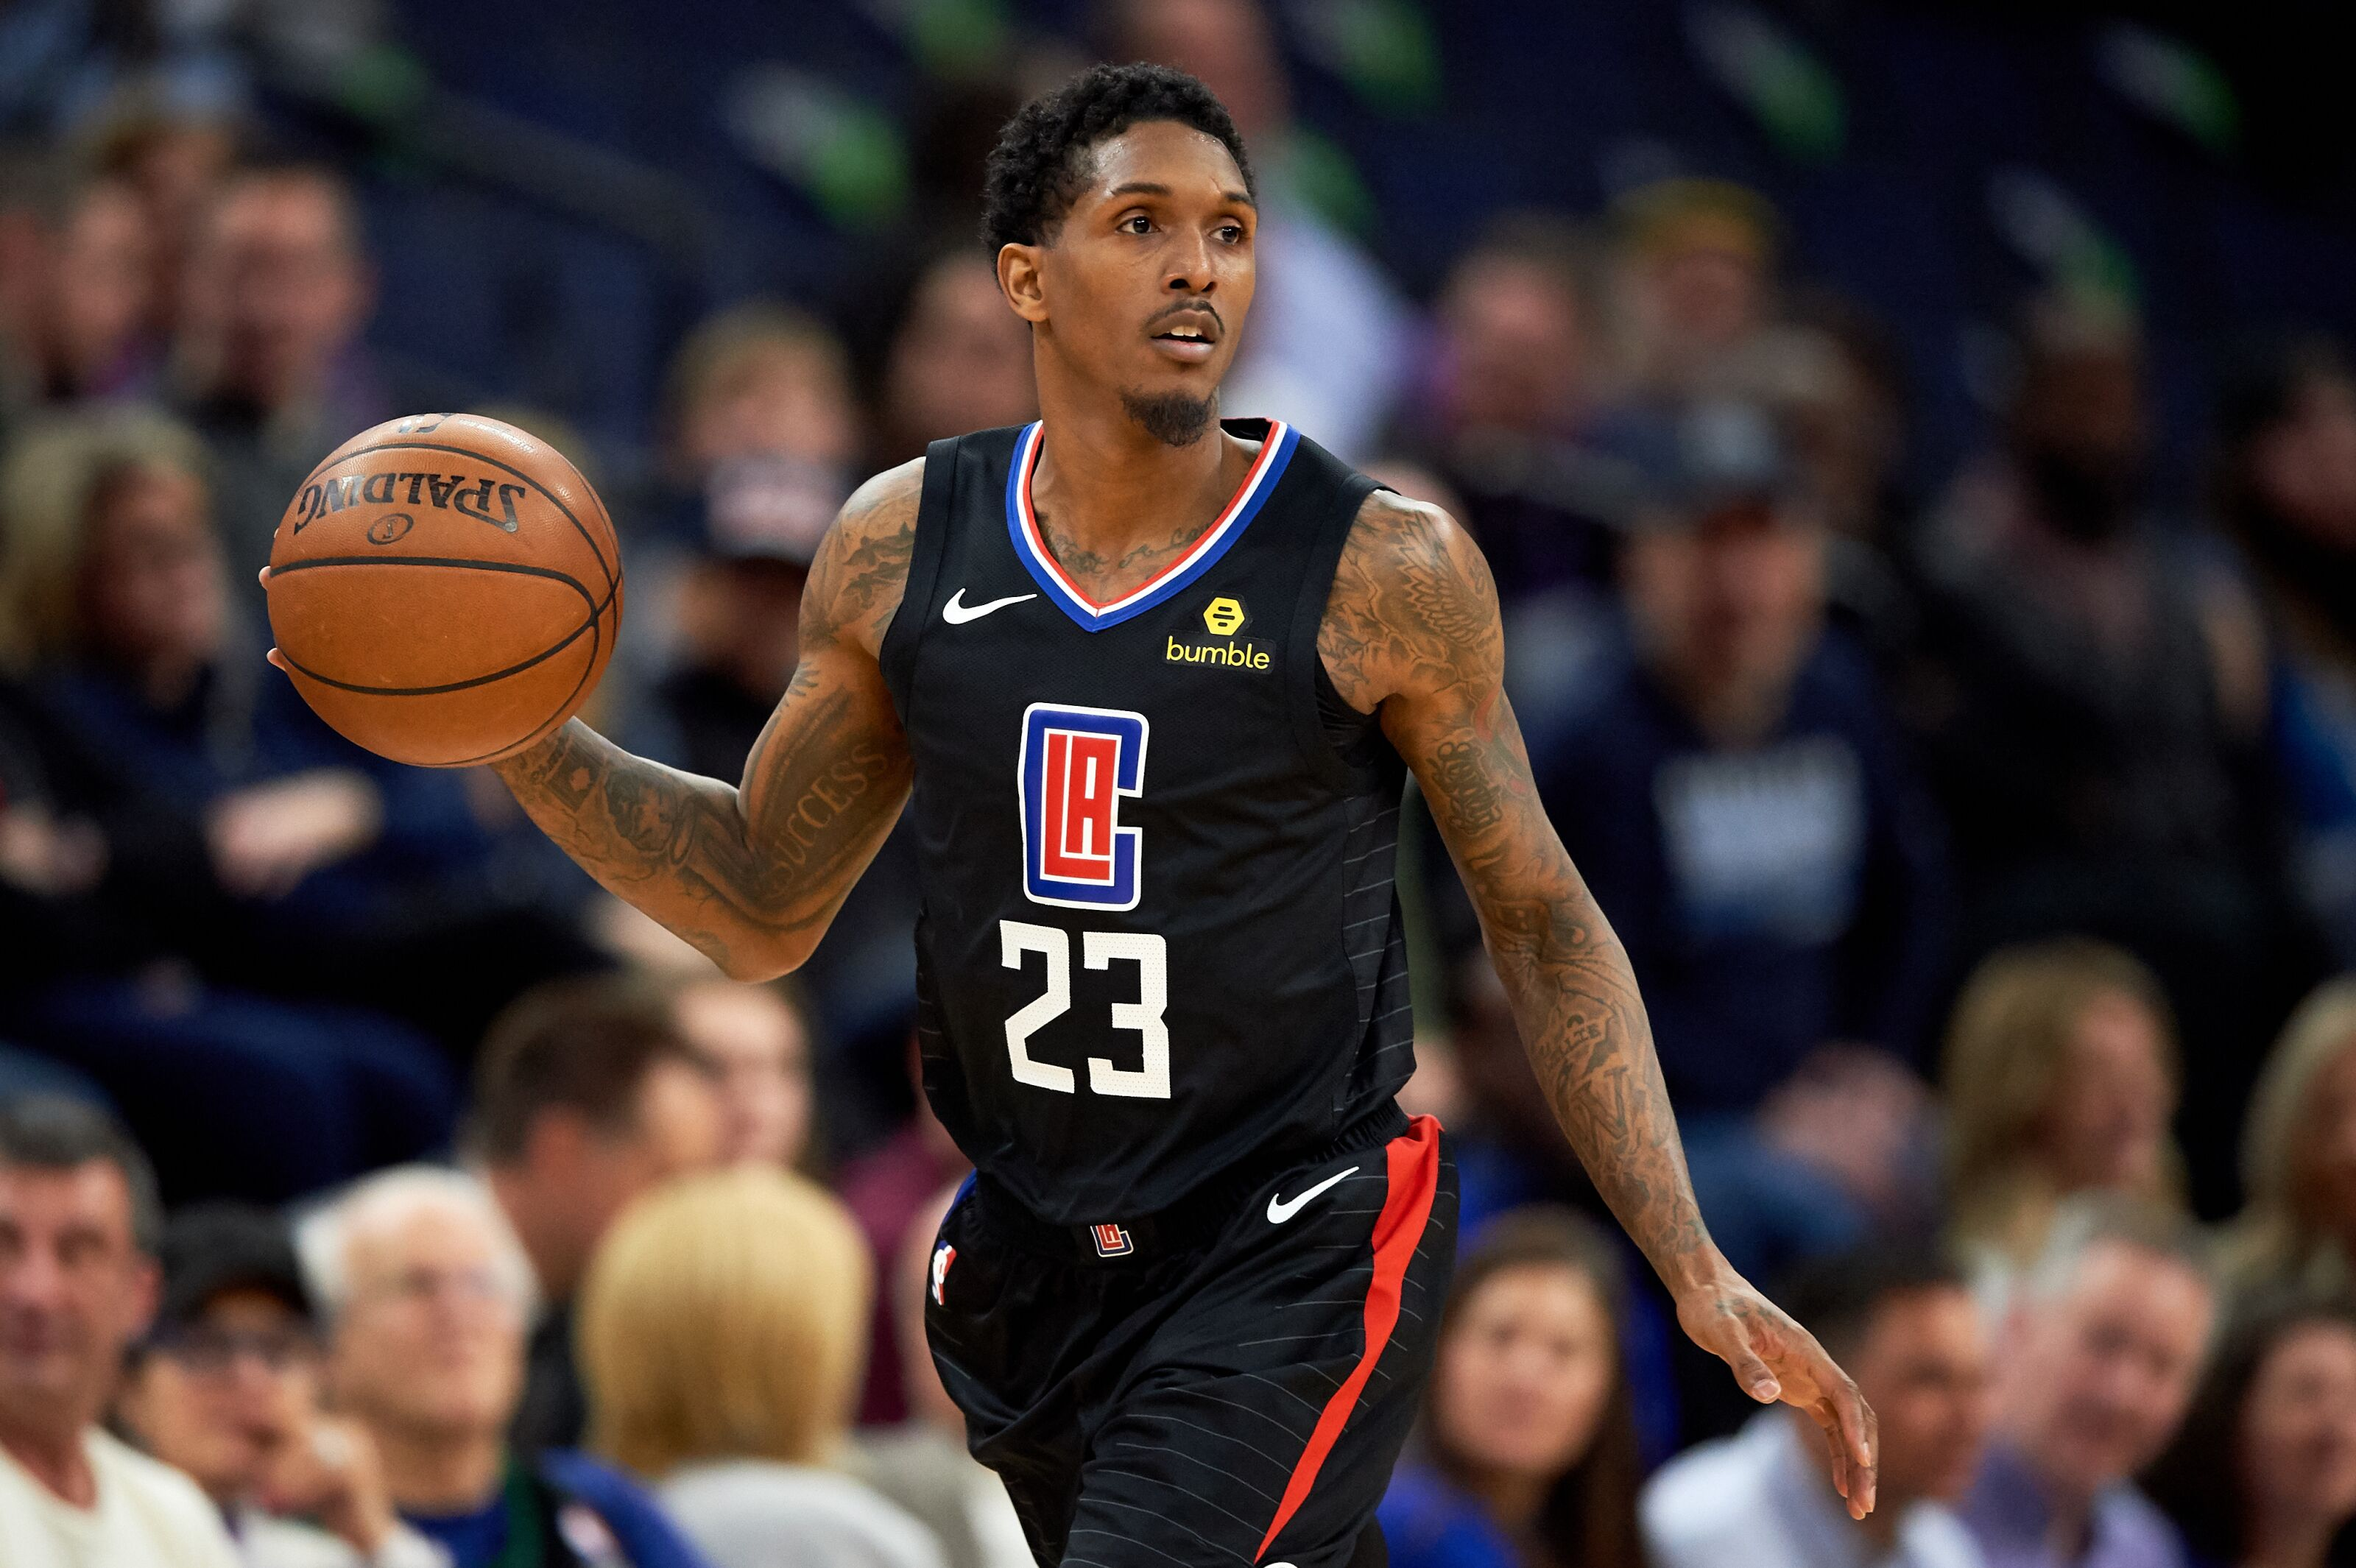 newest 9e728 80683 LA Clippers' Lou Williams Having an Historic Season off the ...